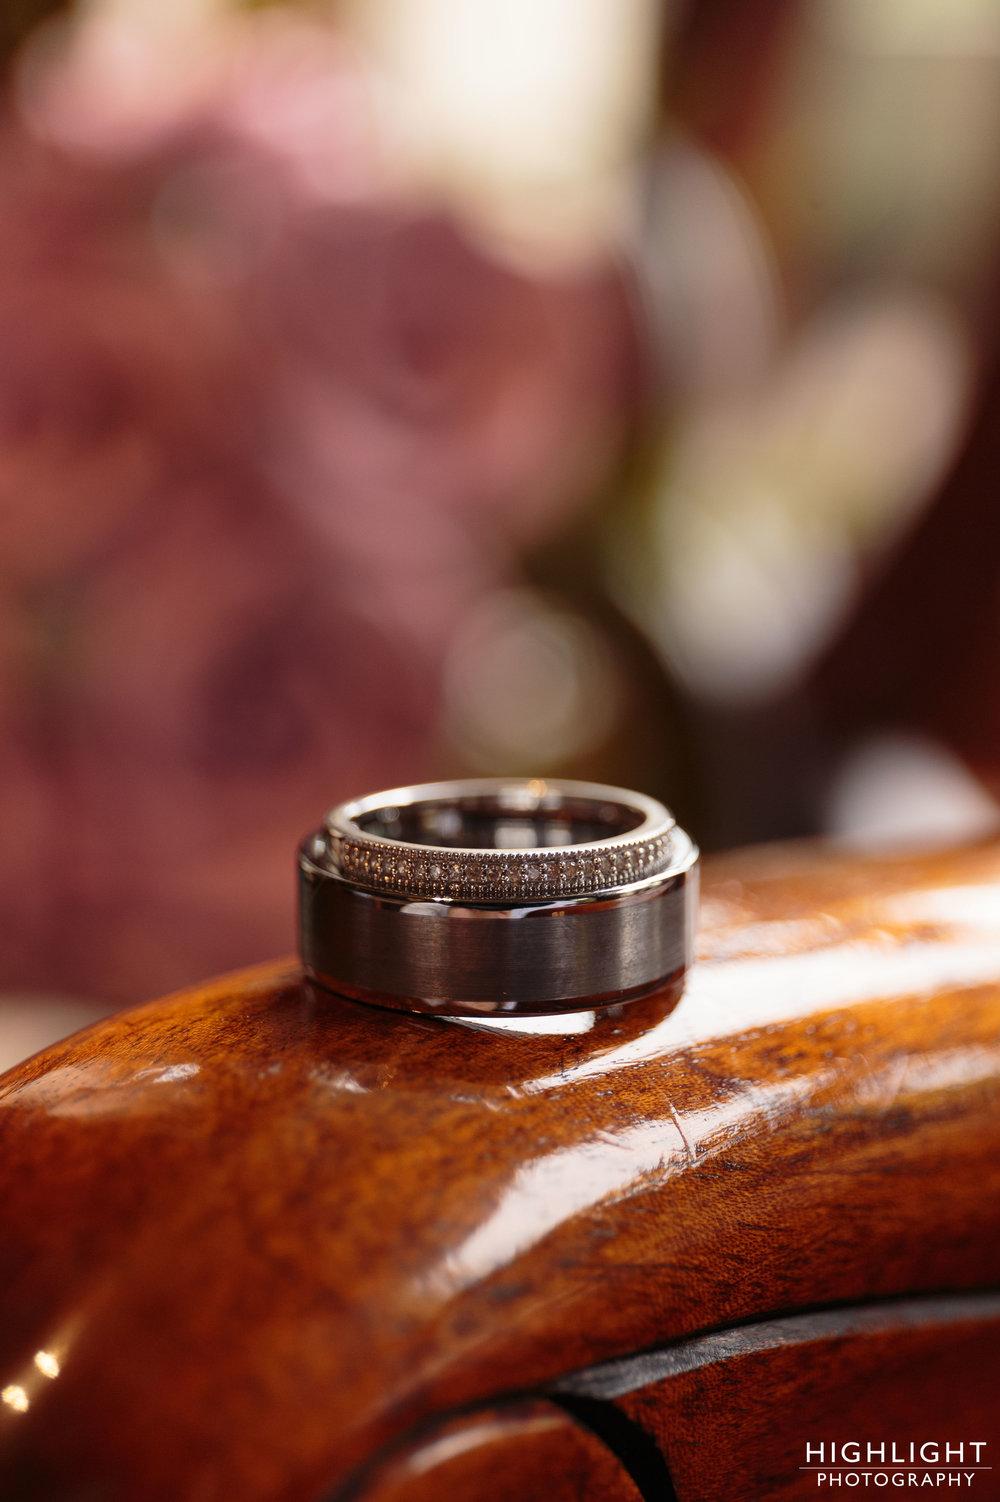 highlight-wedding-photography-whararata-palmerston-north-new-zealand-sarahben-2017-2.jpg